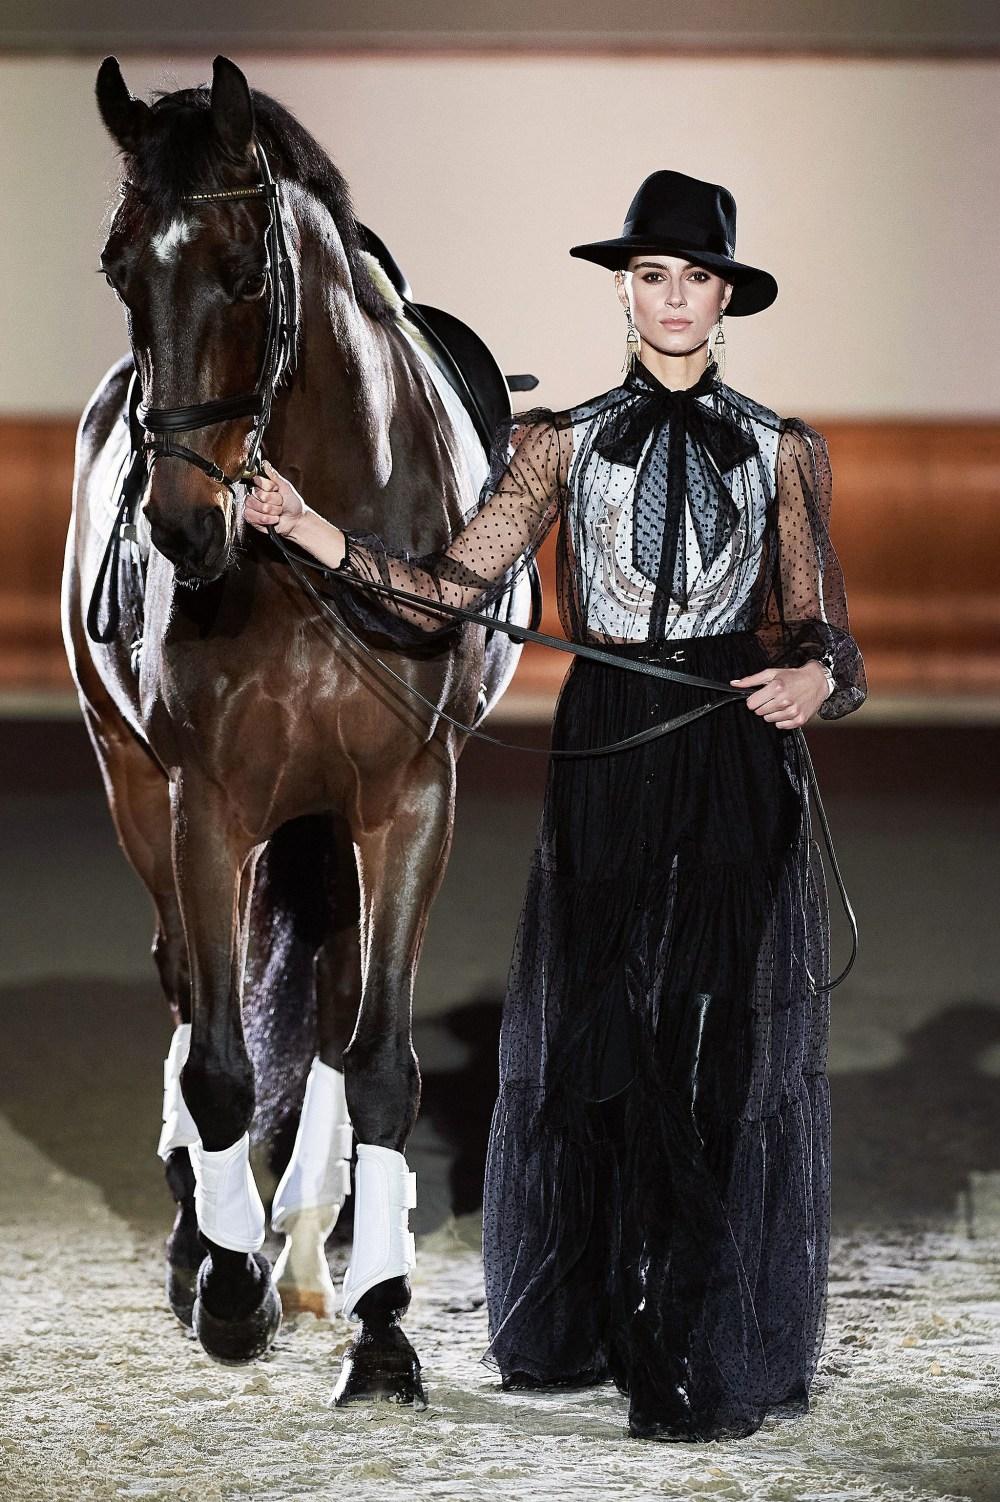 Elisabetta Franchi: Elisabetta Franchi Fall Winter 2021-22 Fashion Show Photo #61